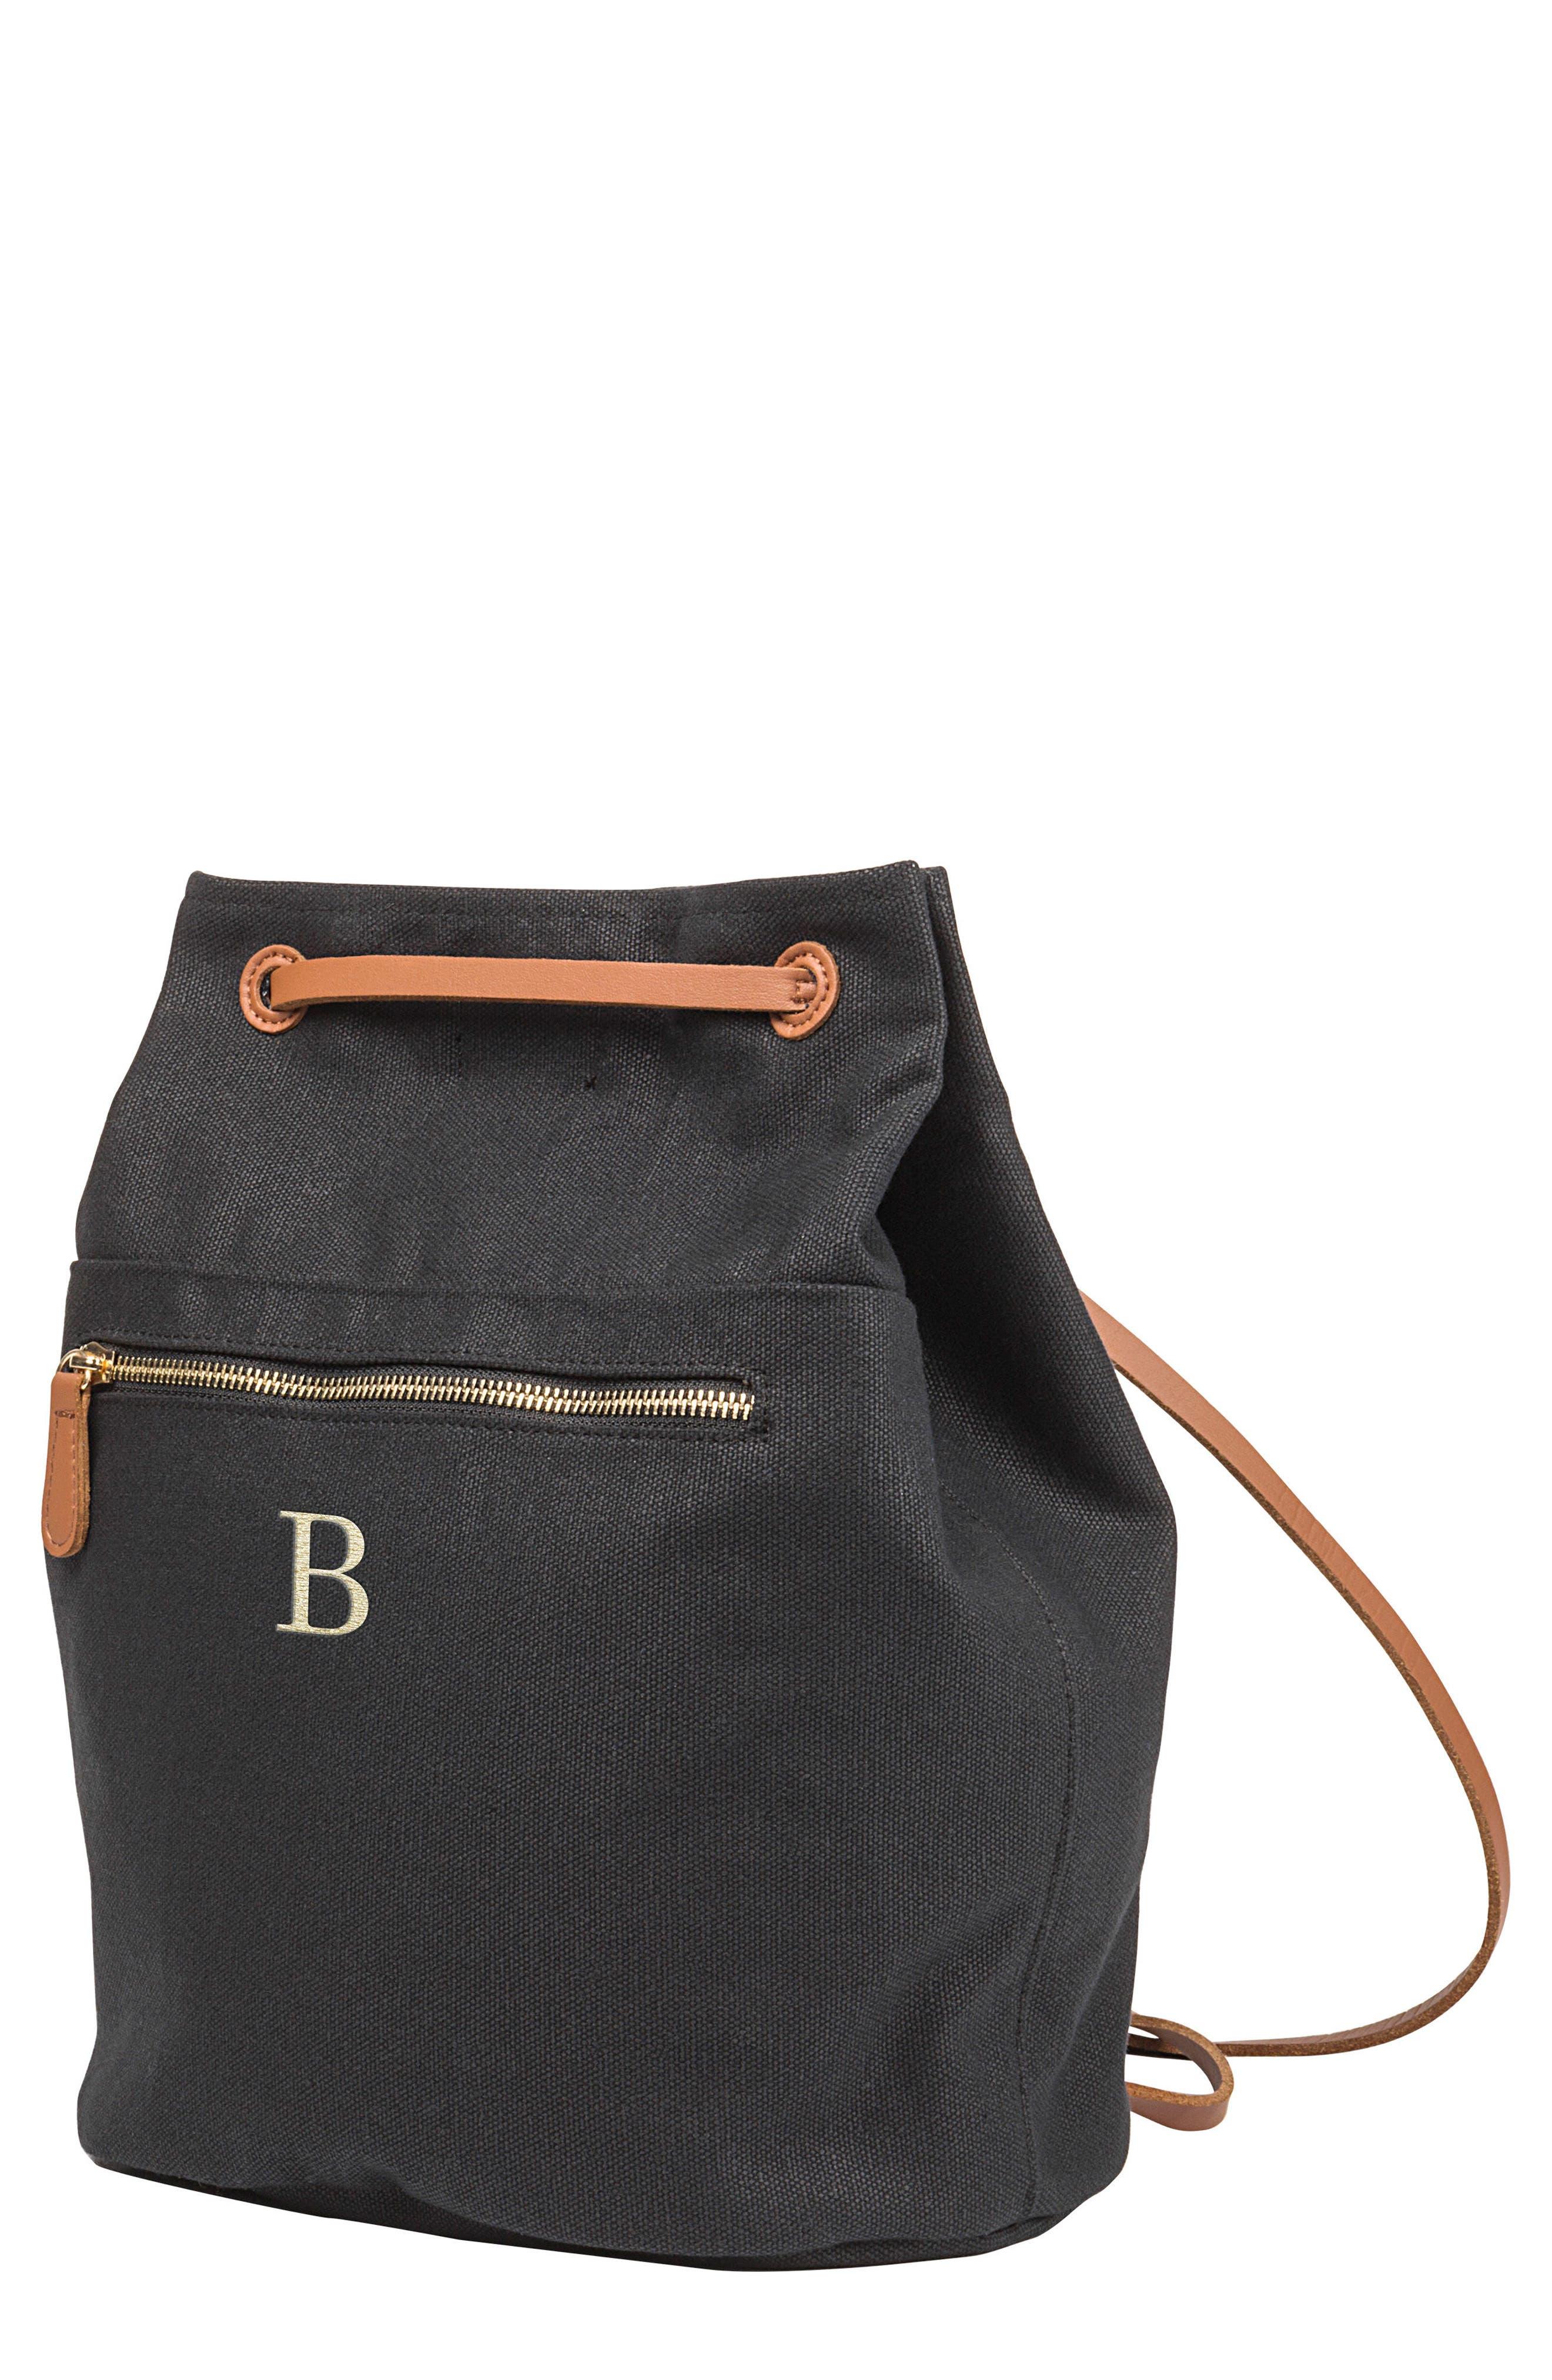 Monogram Convertible Backpack,                             Main thumbnail 3, color,